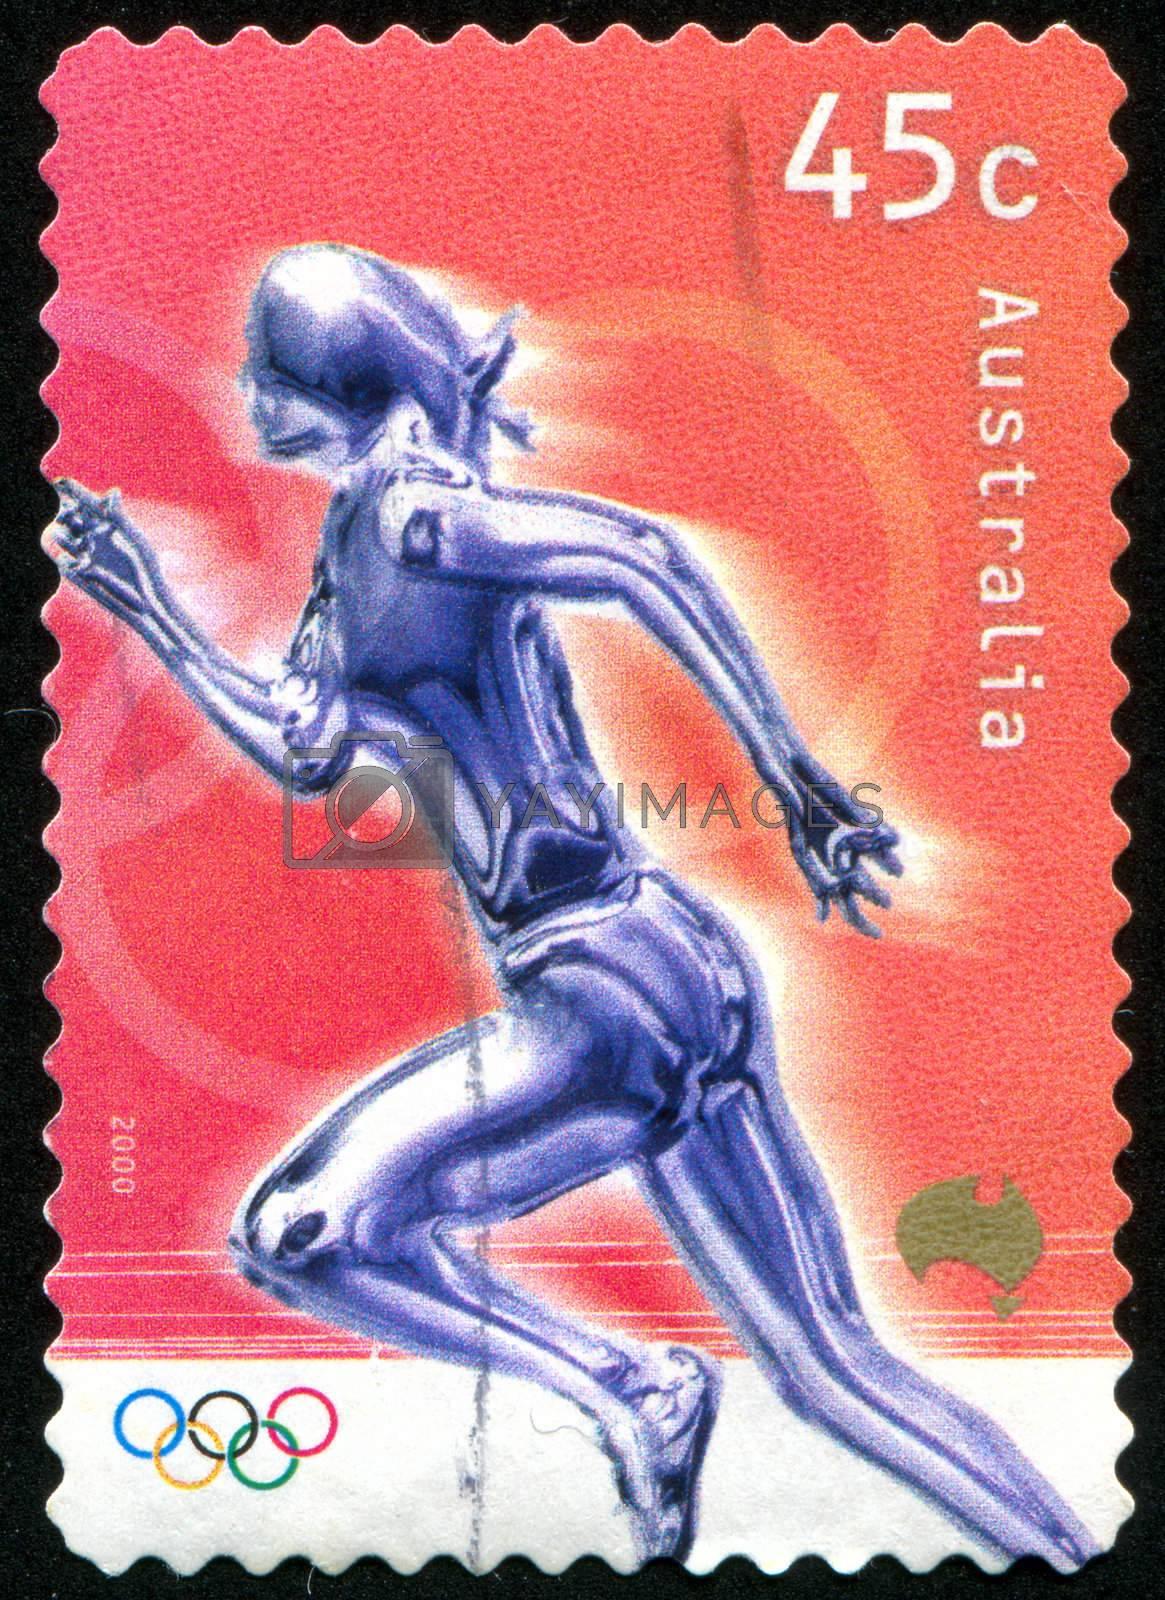 AUSTRALIA - CIRCA 2000: stamp printed by Australia, shows runner, circa 2000